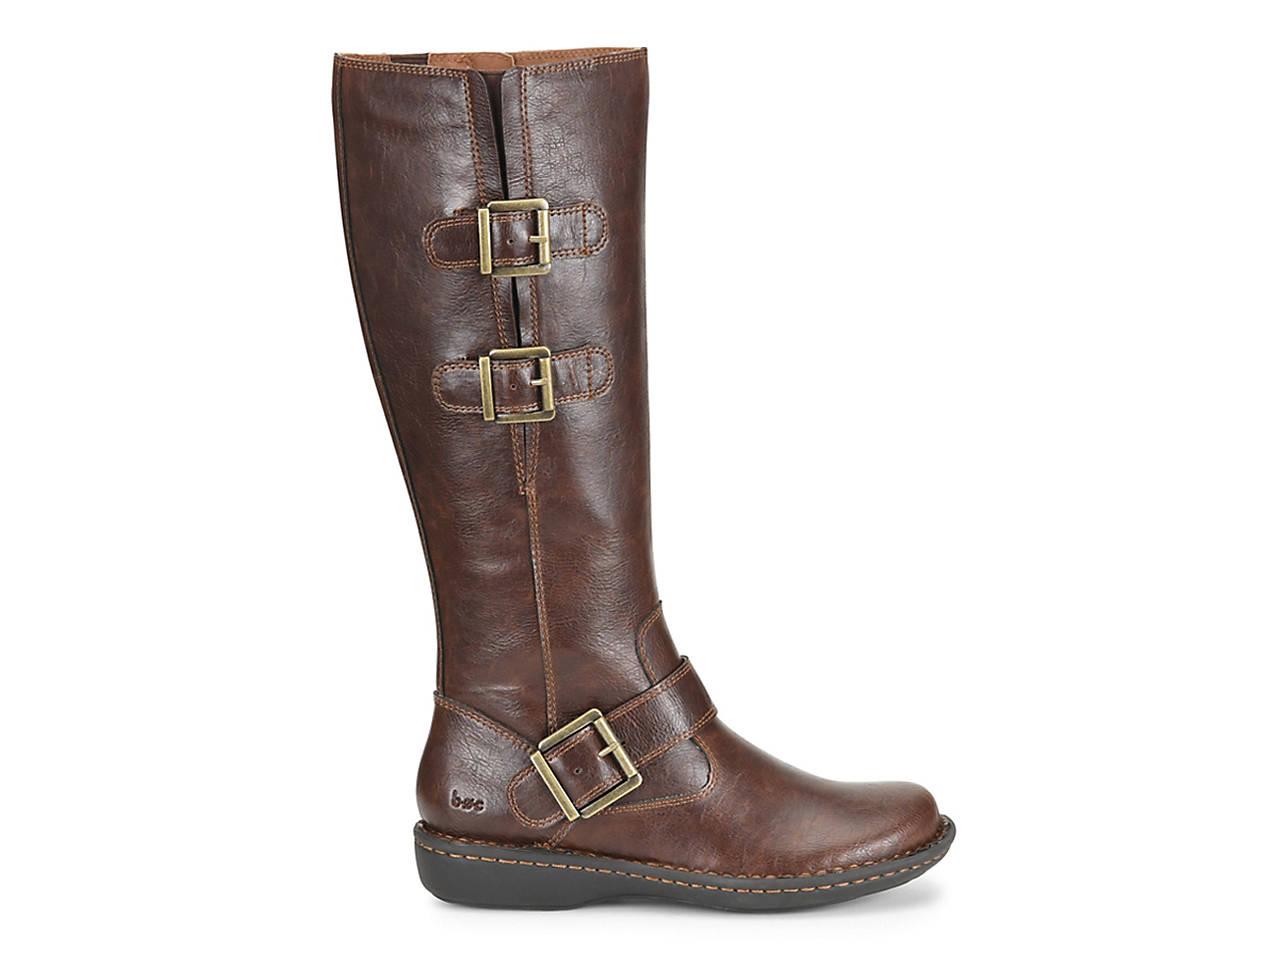 cheap sale outlet Women's B.O.C. Virginia Riding Boots outlet fashionable outlet popular sale classic CCcjXb